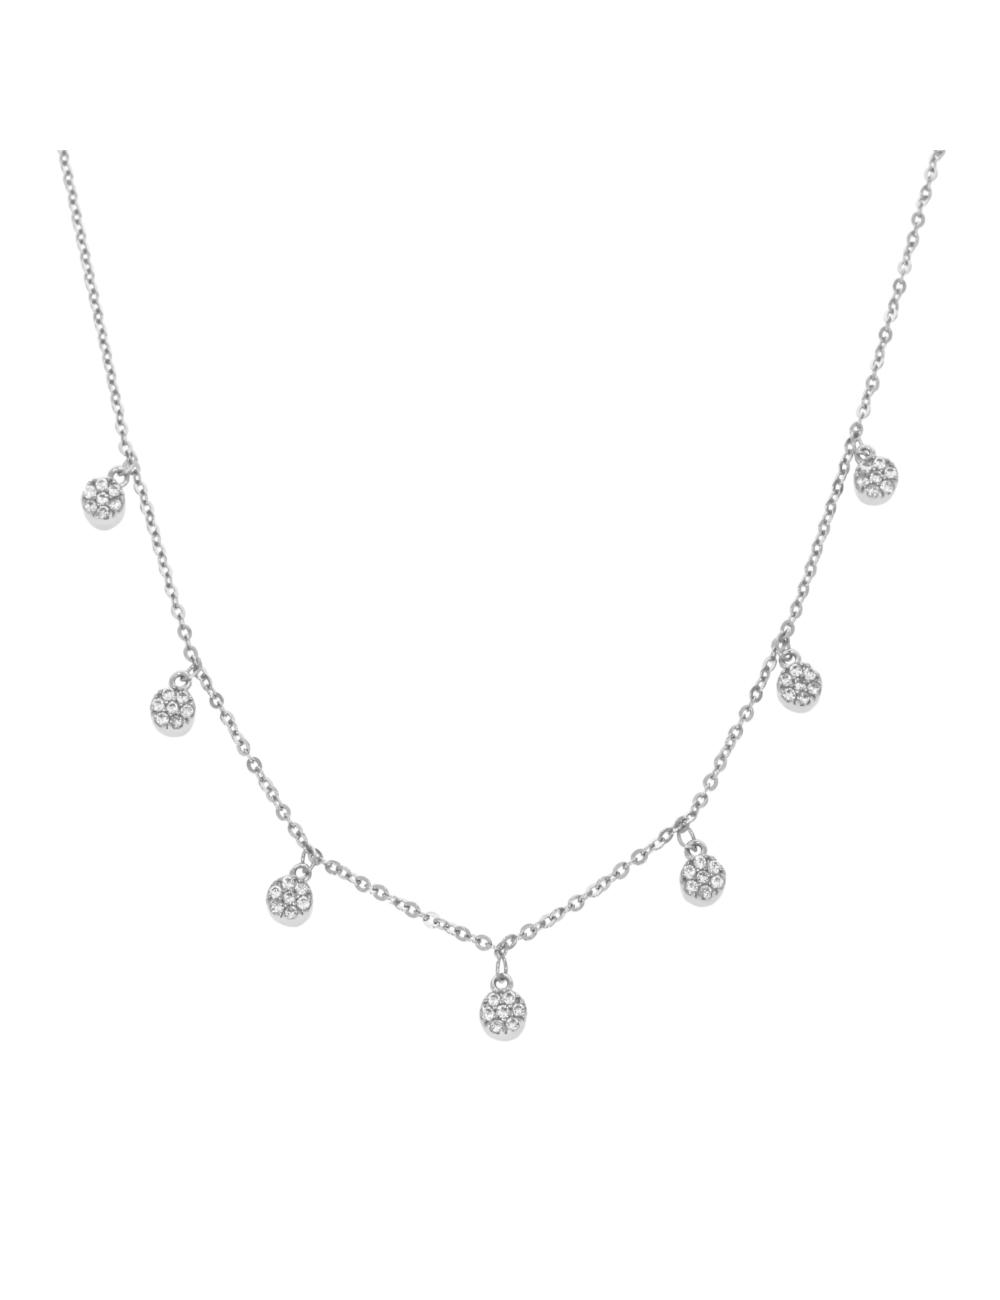 10012322 Naszyjnik srebrny pr.925 z cyrkoniami